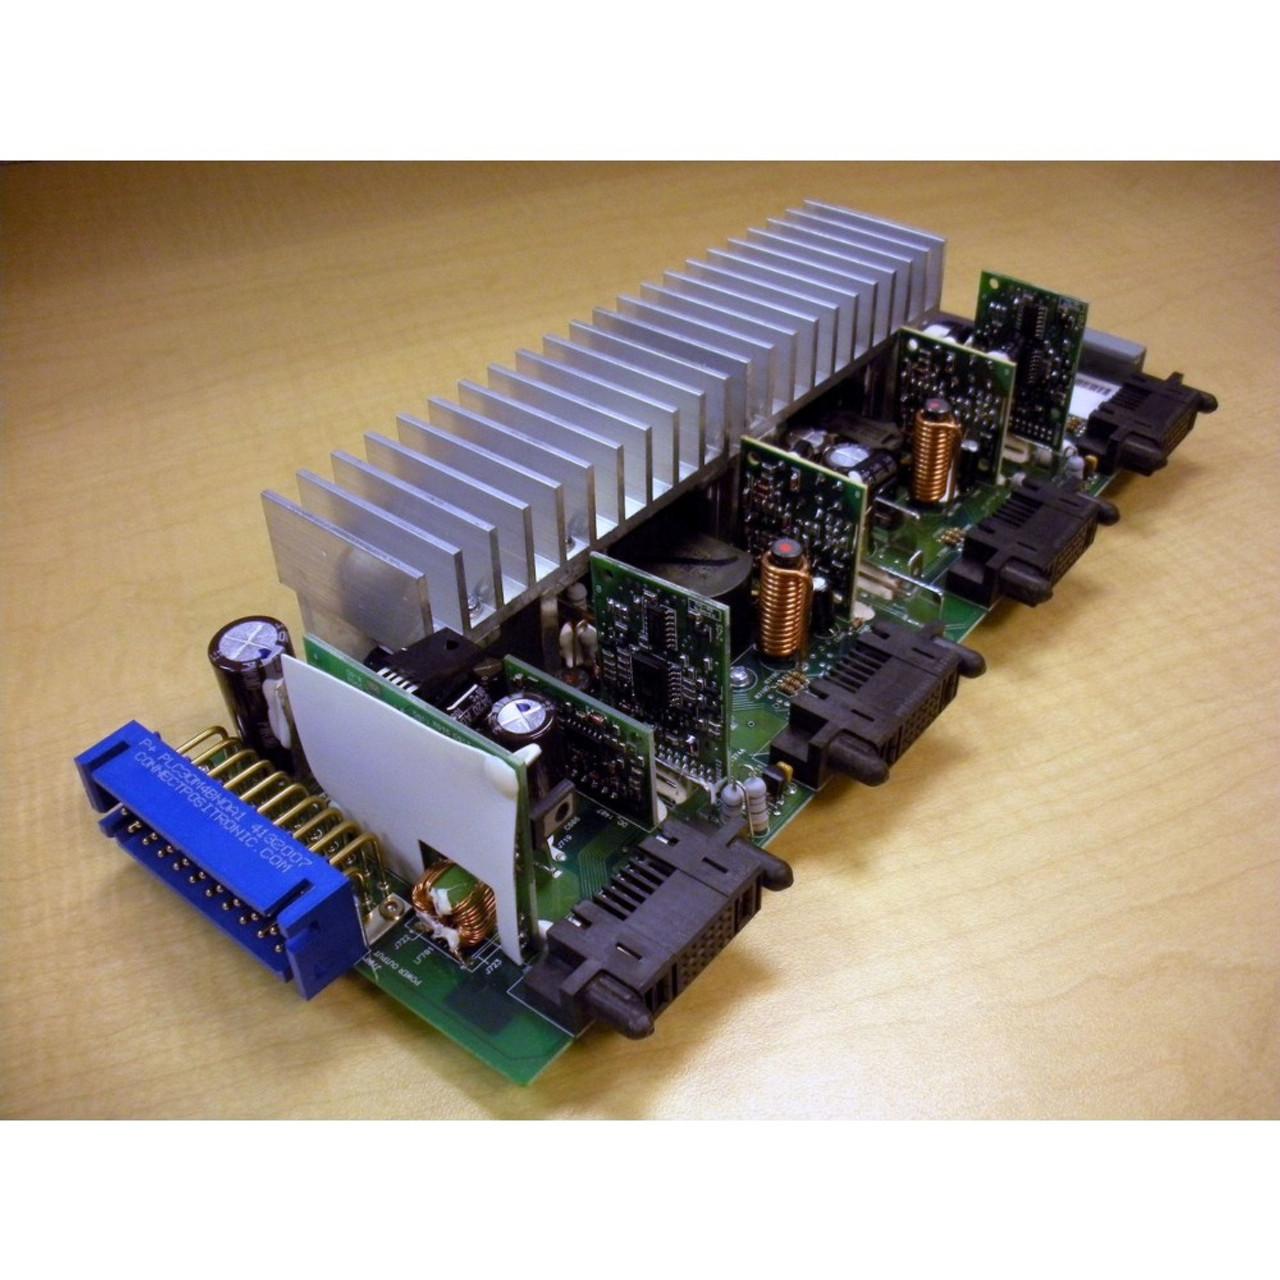 Sun 370-5744 DC Power Distribution Board for SunFire V1280